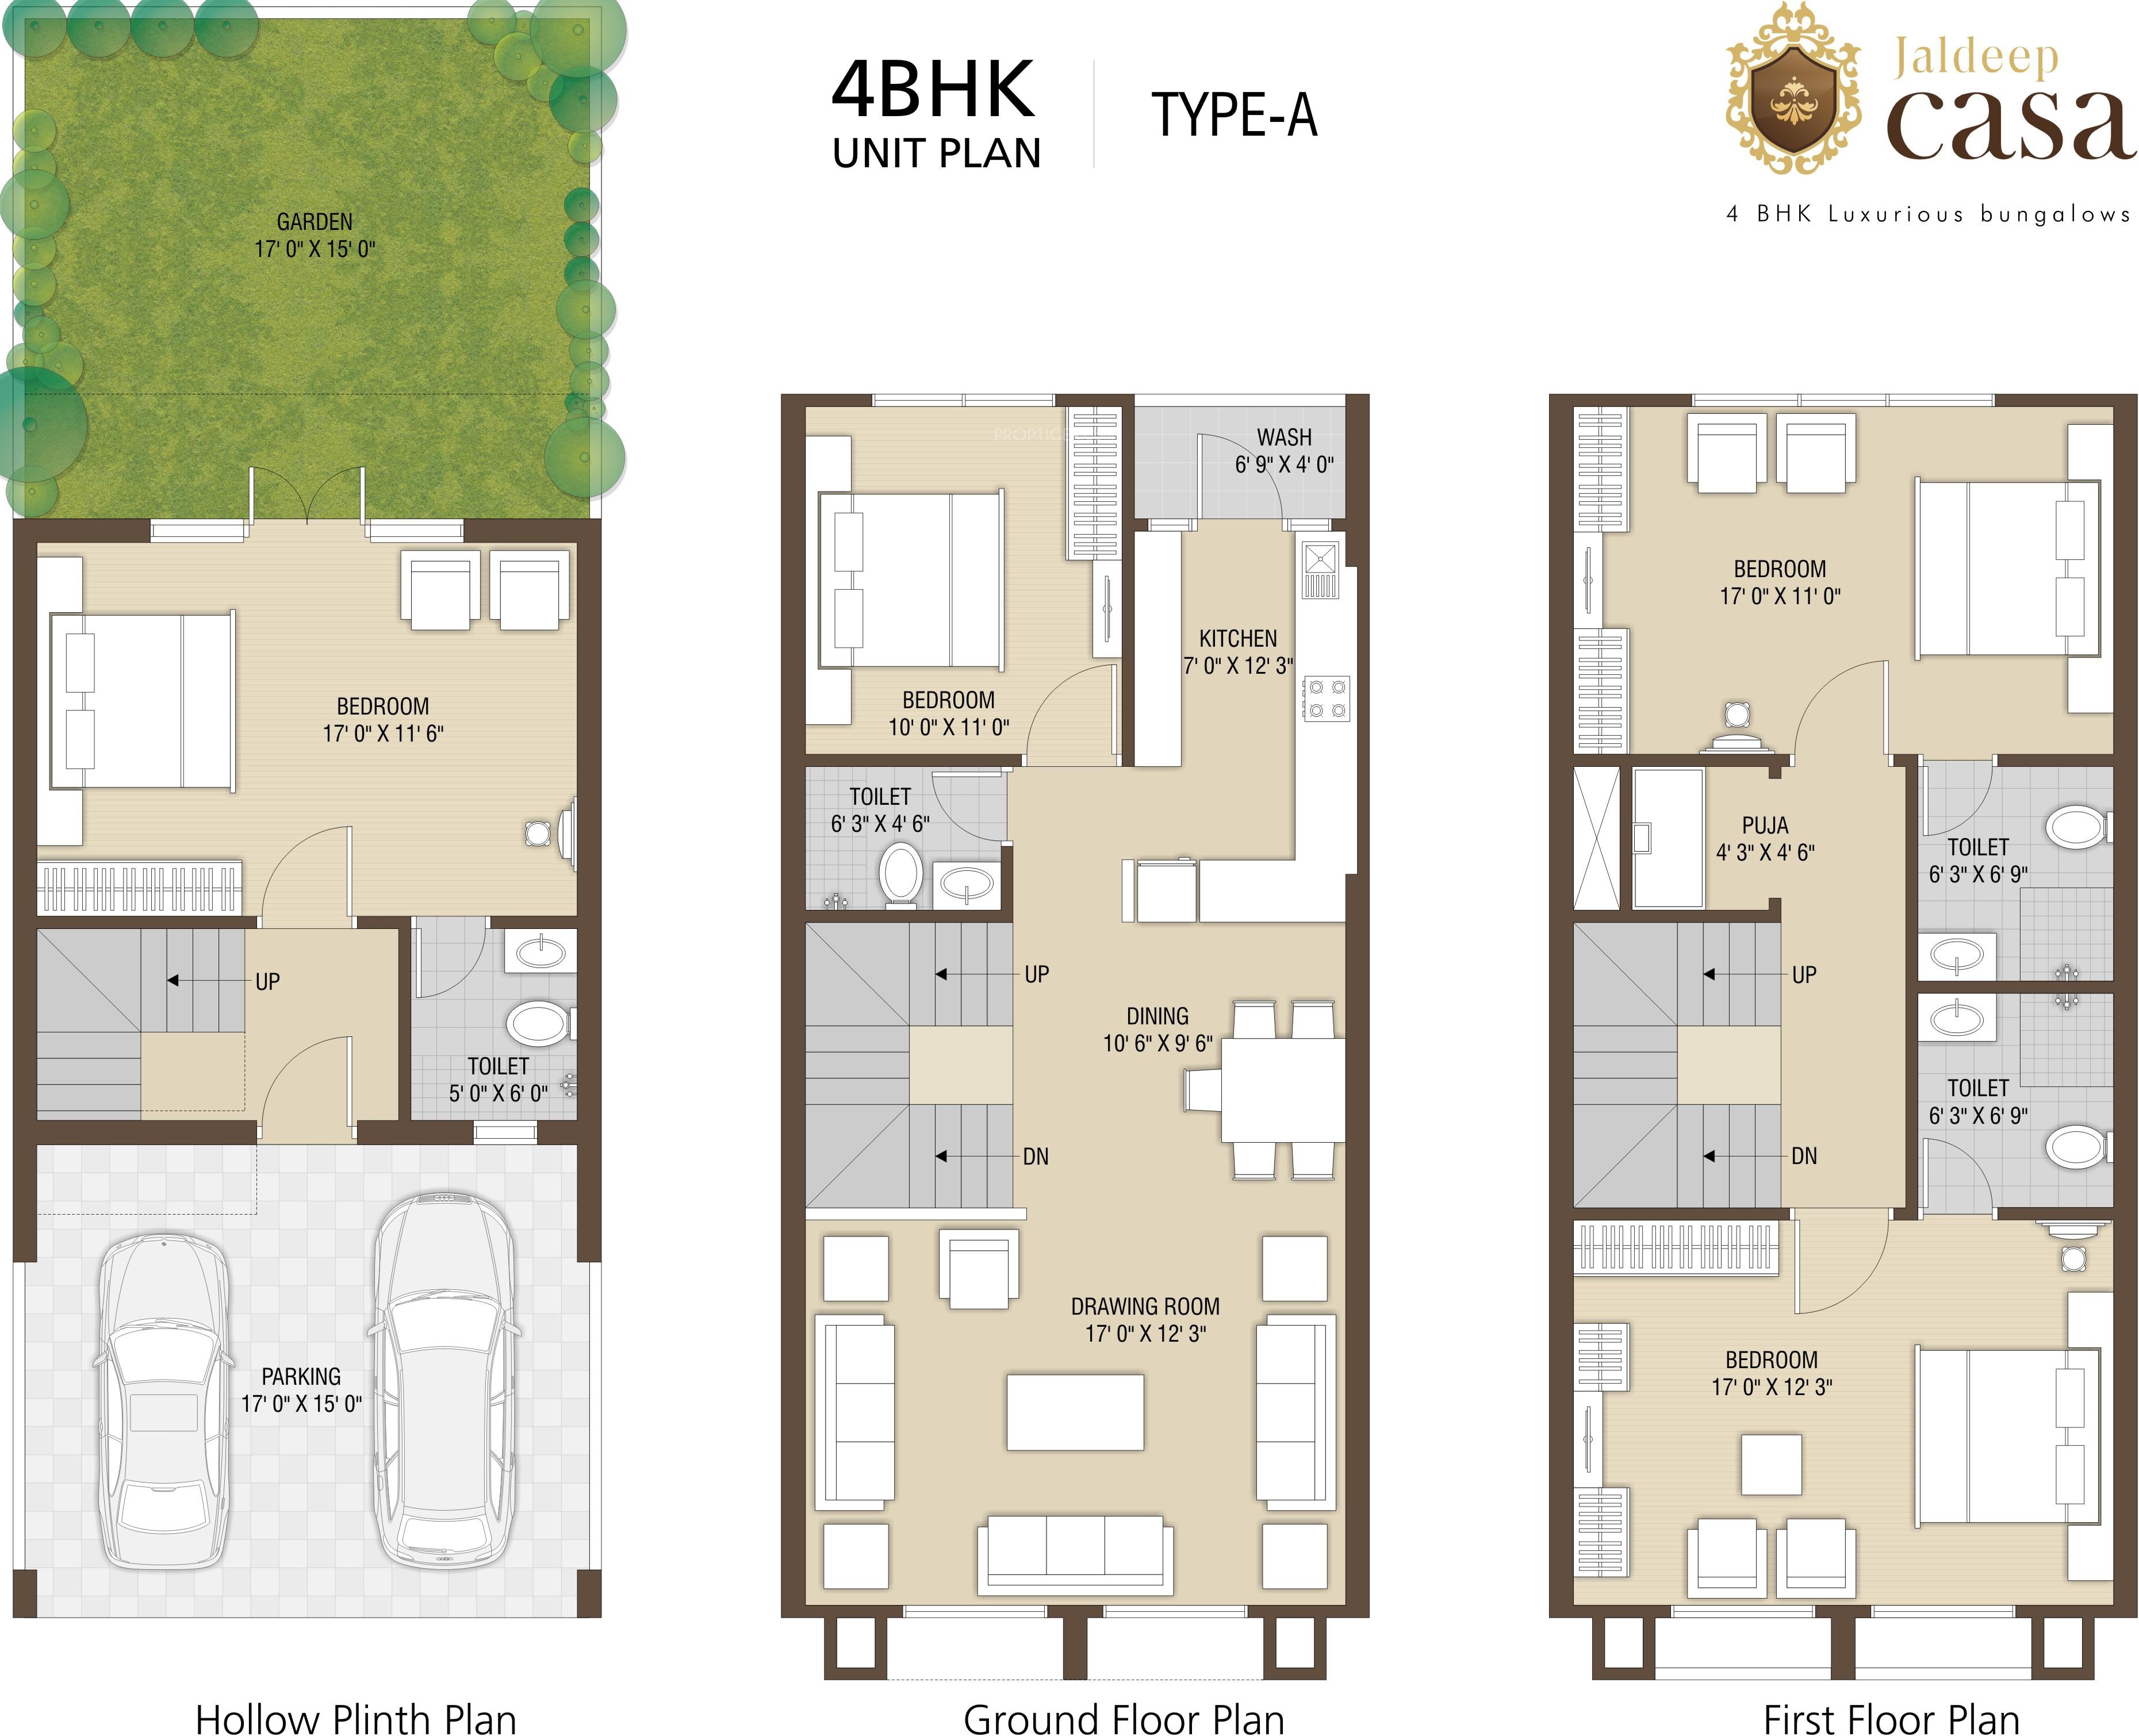 Shree radha jaldeep casa in bopal ahmedabad price for Casa floor